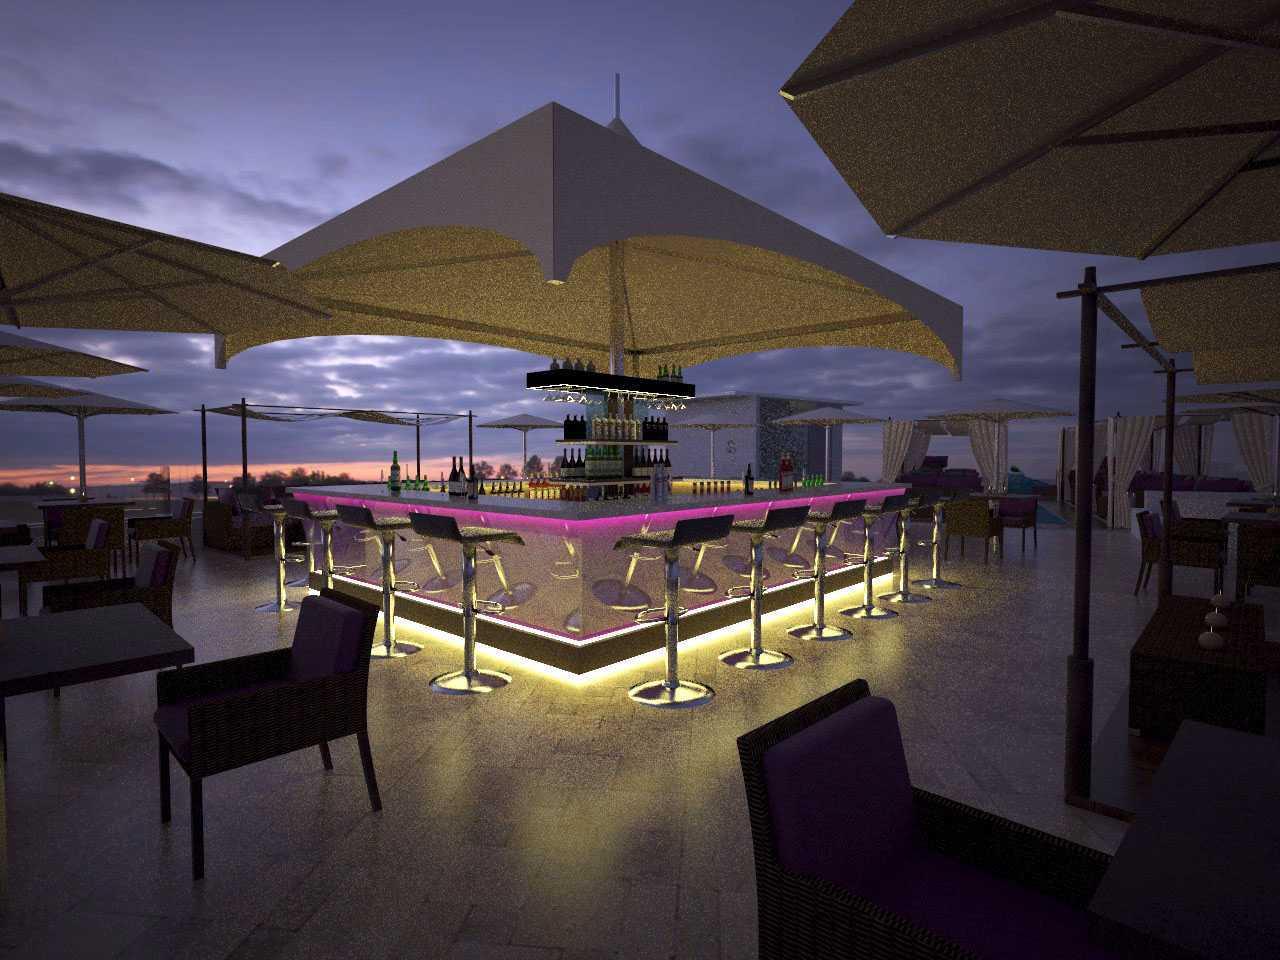 Limpad Sudibyo Premier Inn Hotel Jimbaran, Bali Jimbaran, Bali Sky-Bar-1   27077